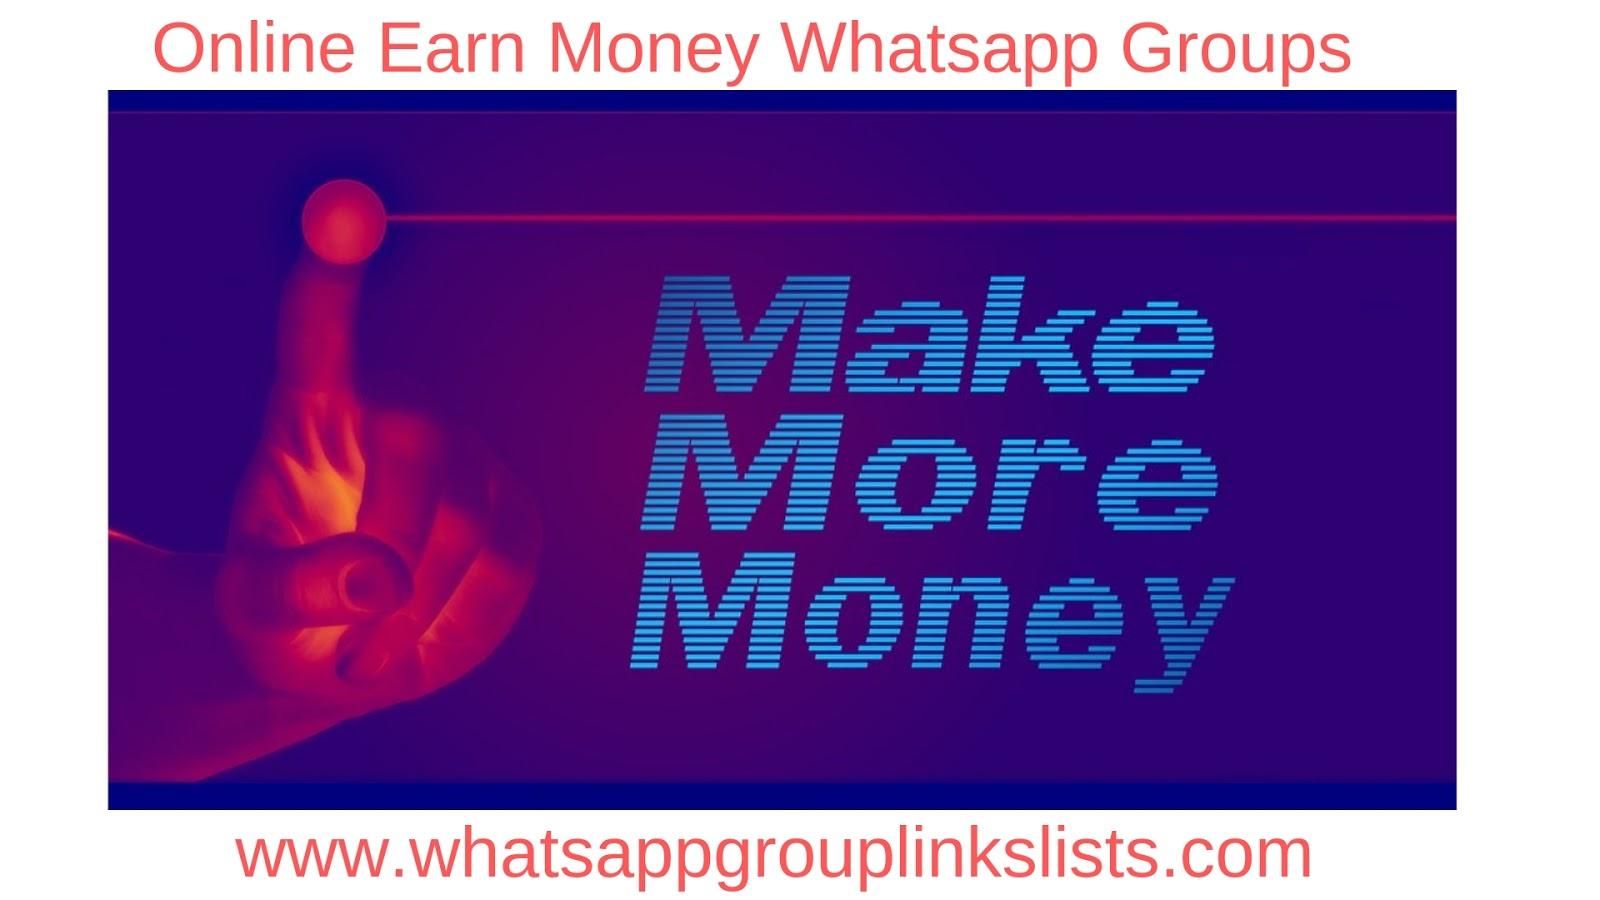 Join Online Earn Money Whatsapp Group Links List